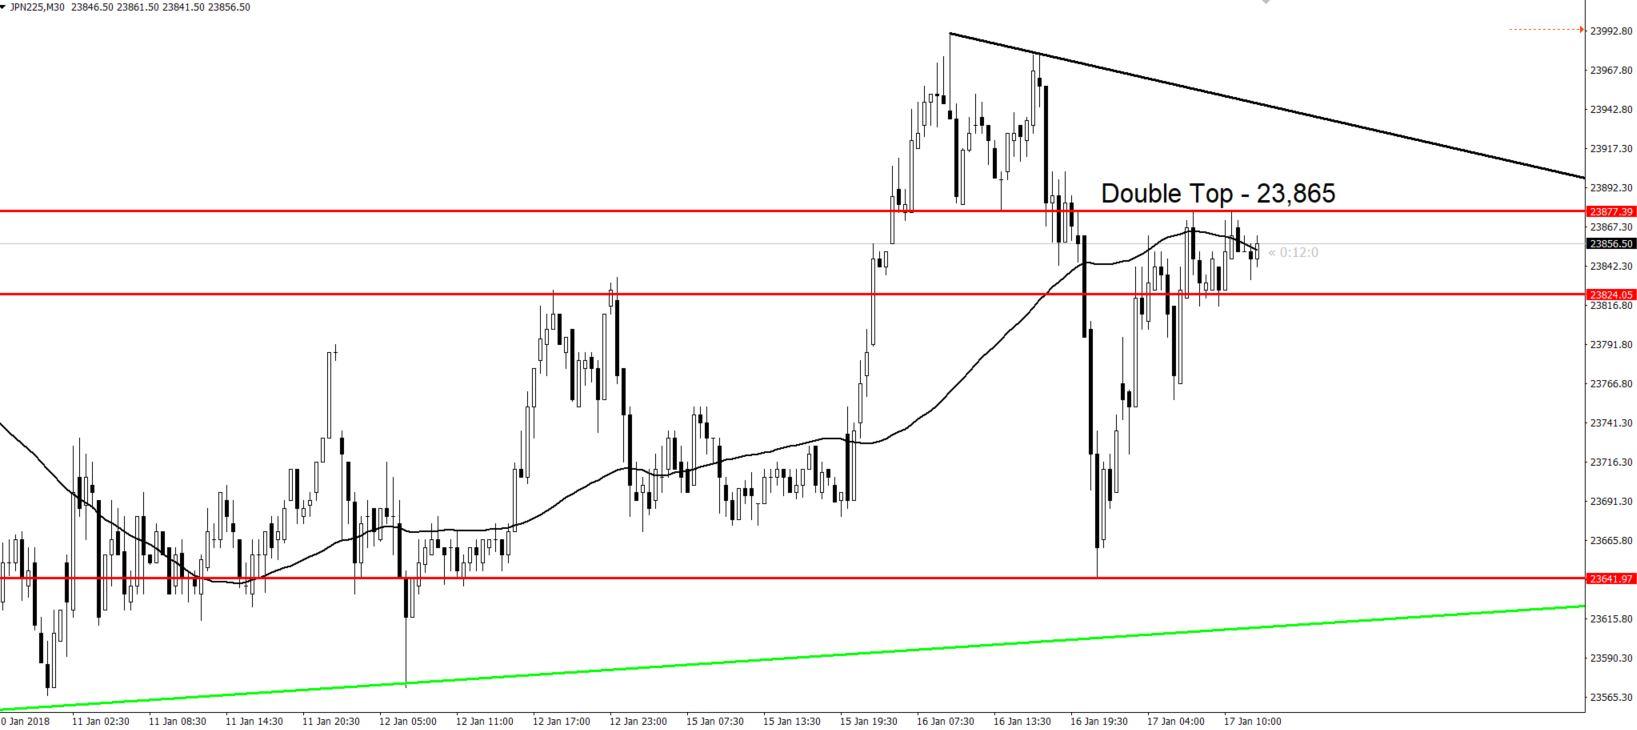 Nikkei - 30 - Min Chart - Double Top Pattern